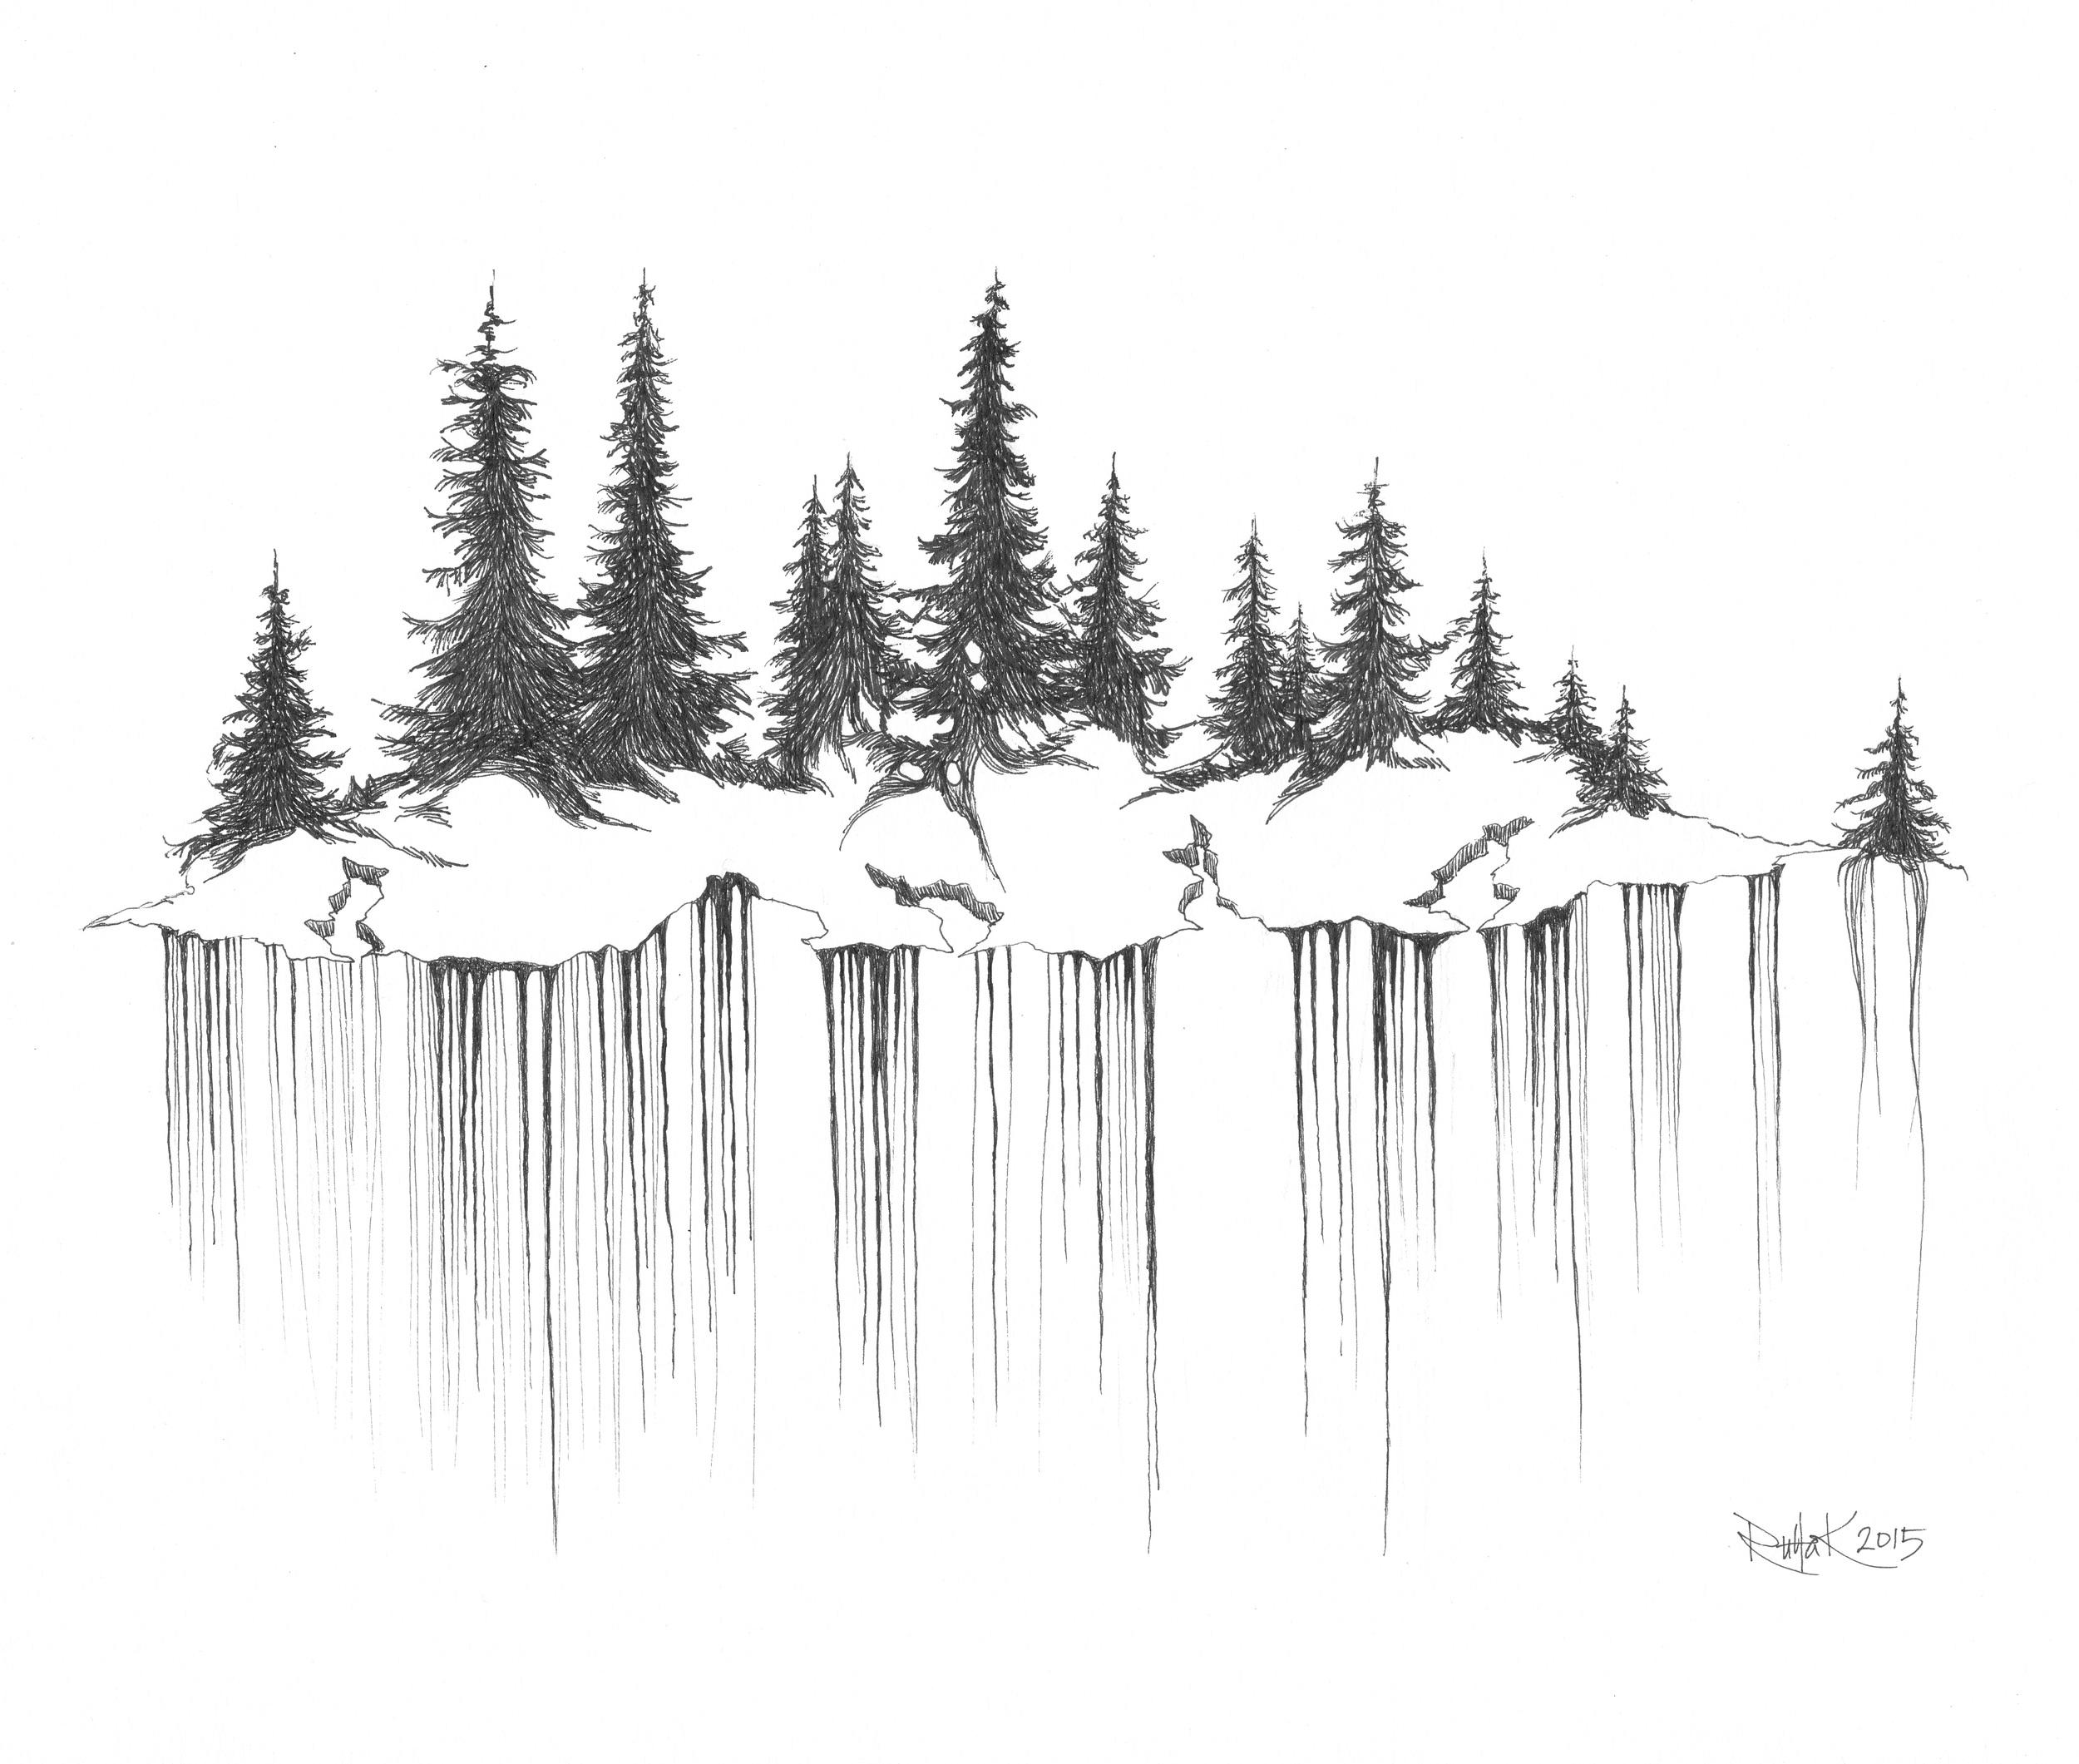 Where we belong #8, fine pen on paper, 29 x 35.5 cm, 7800hkd.jpg